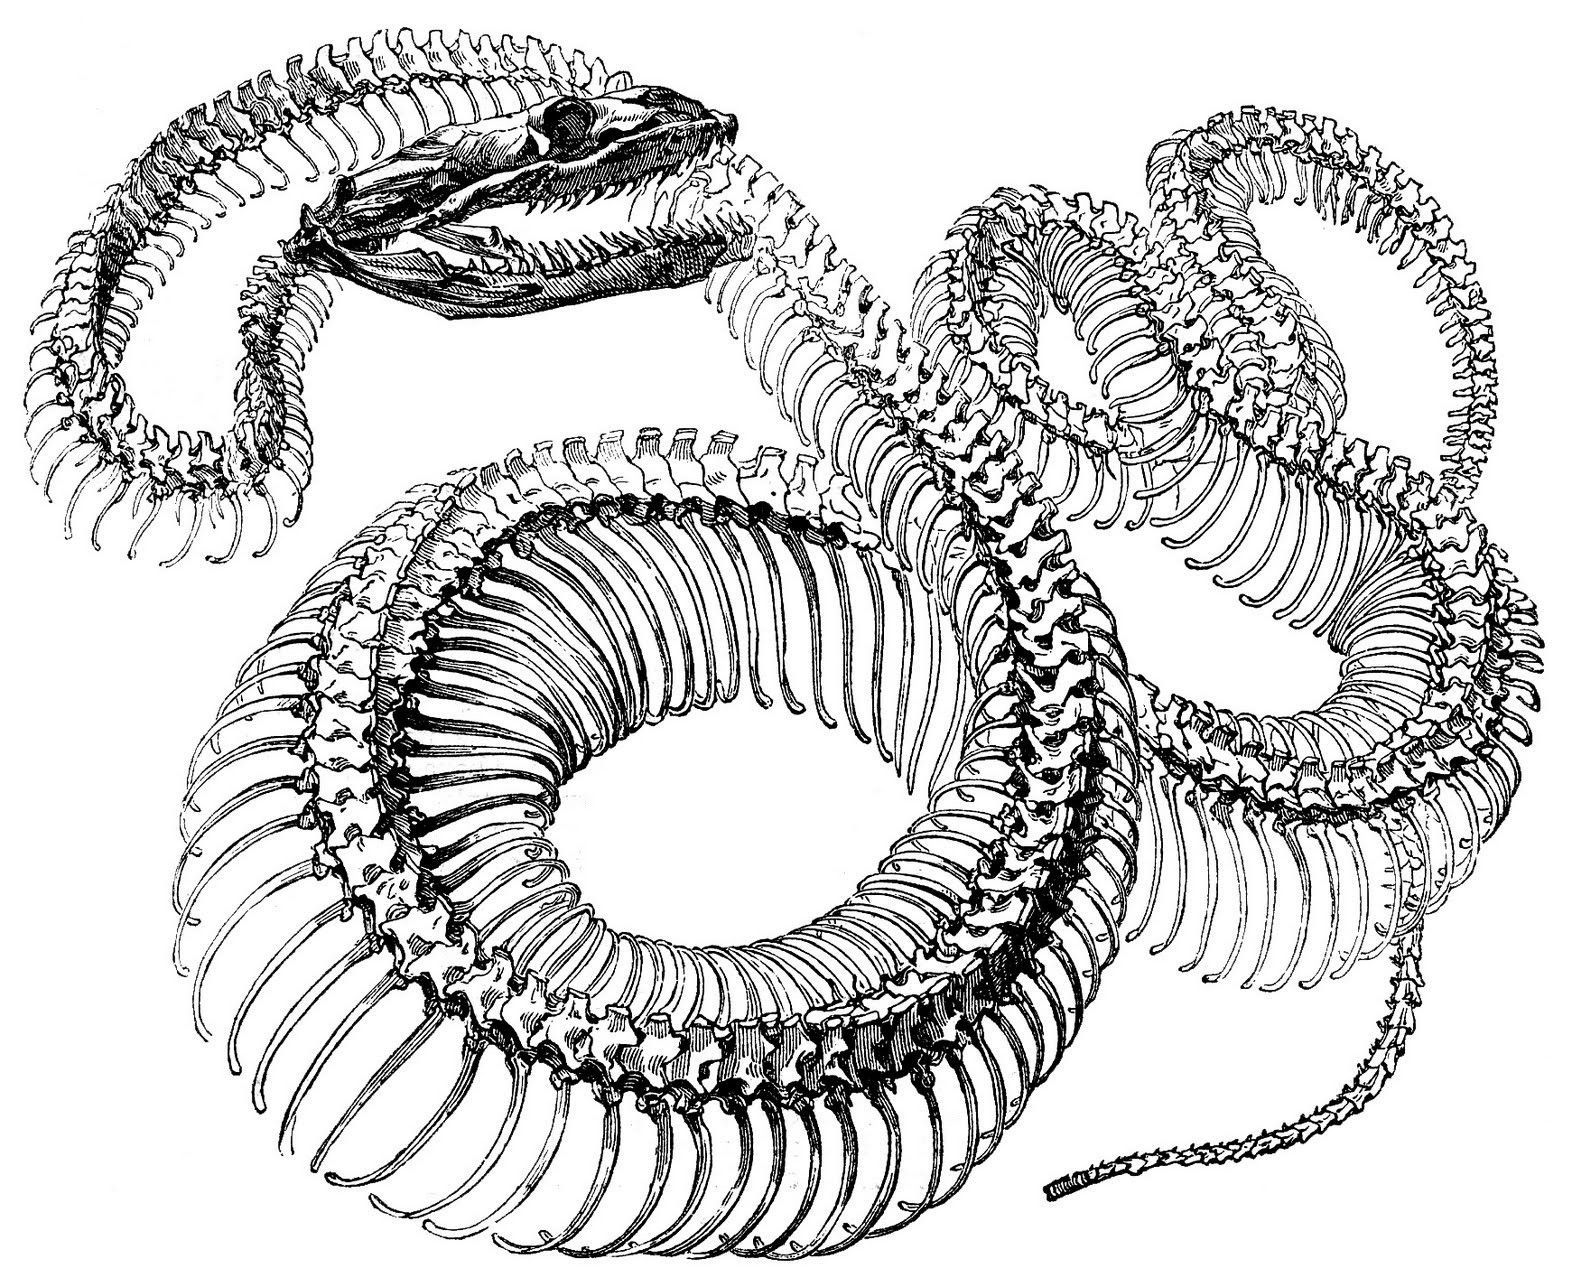 snake skeleton drawing at getdrawings com free for personal use rh getdrawings com Chameleon Skeleton Diagram Snake Parts Diagram